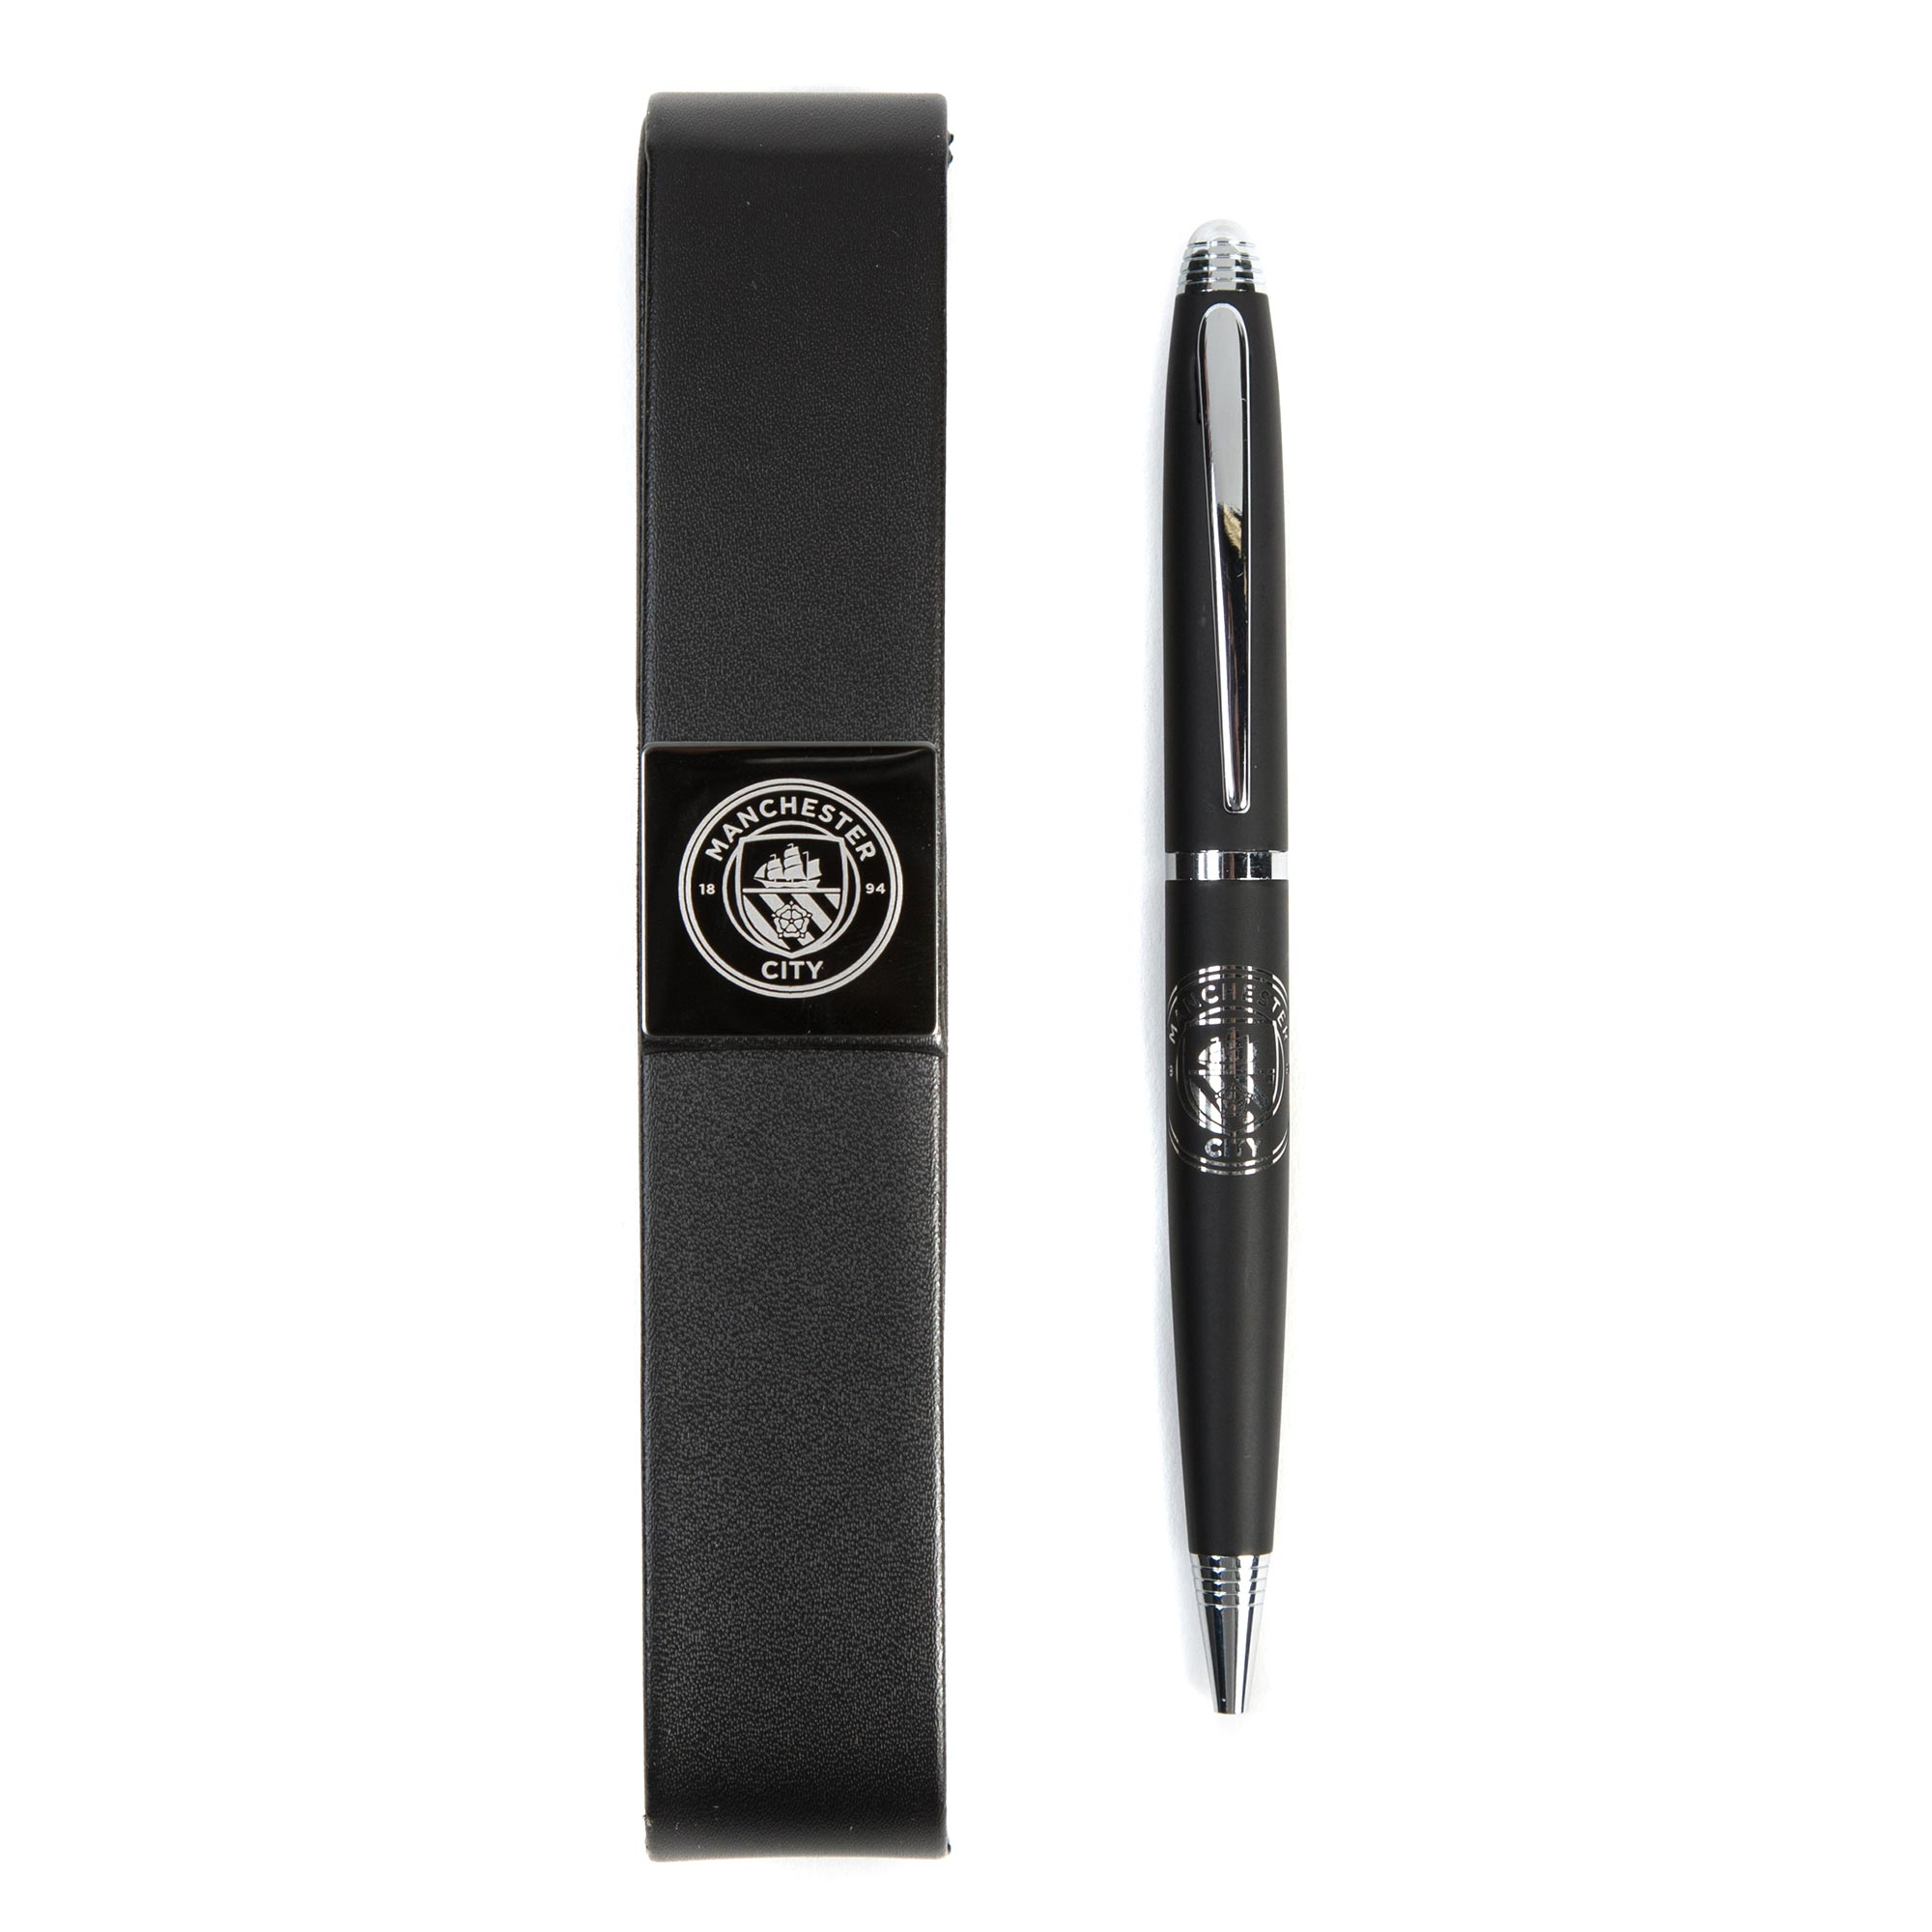 Manchester City Ballpoint Pen in Magnet Case